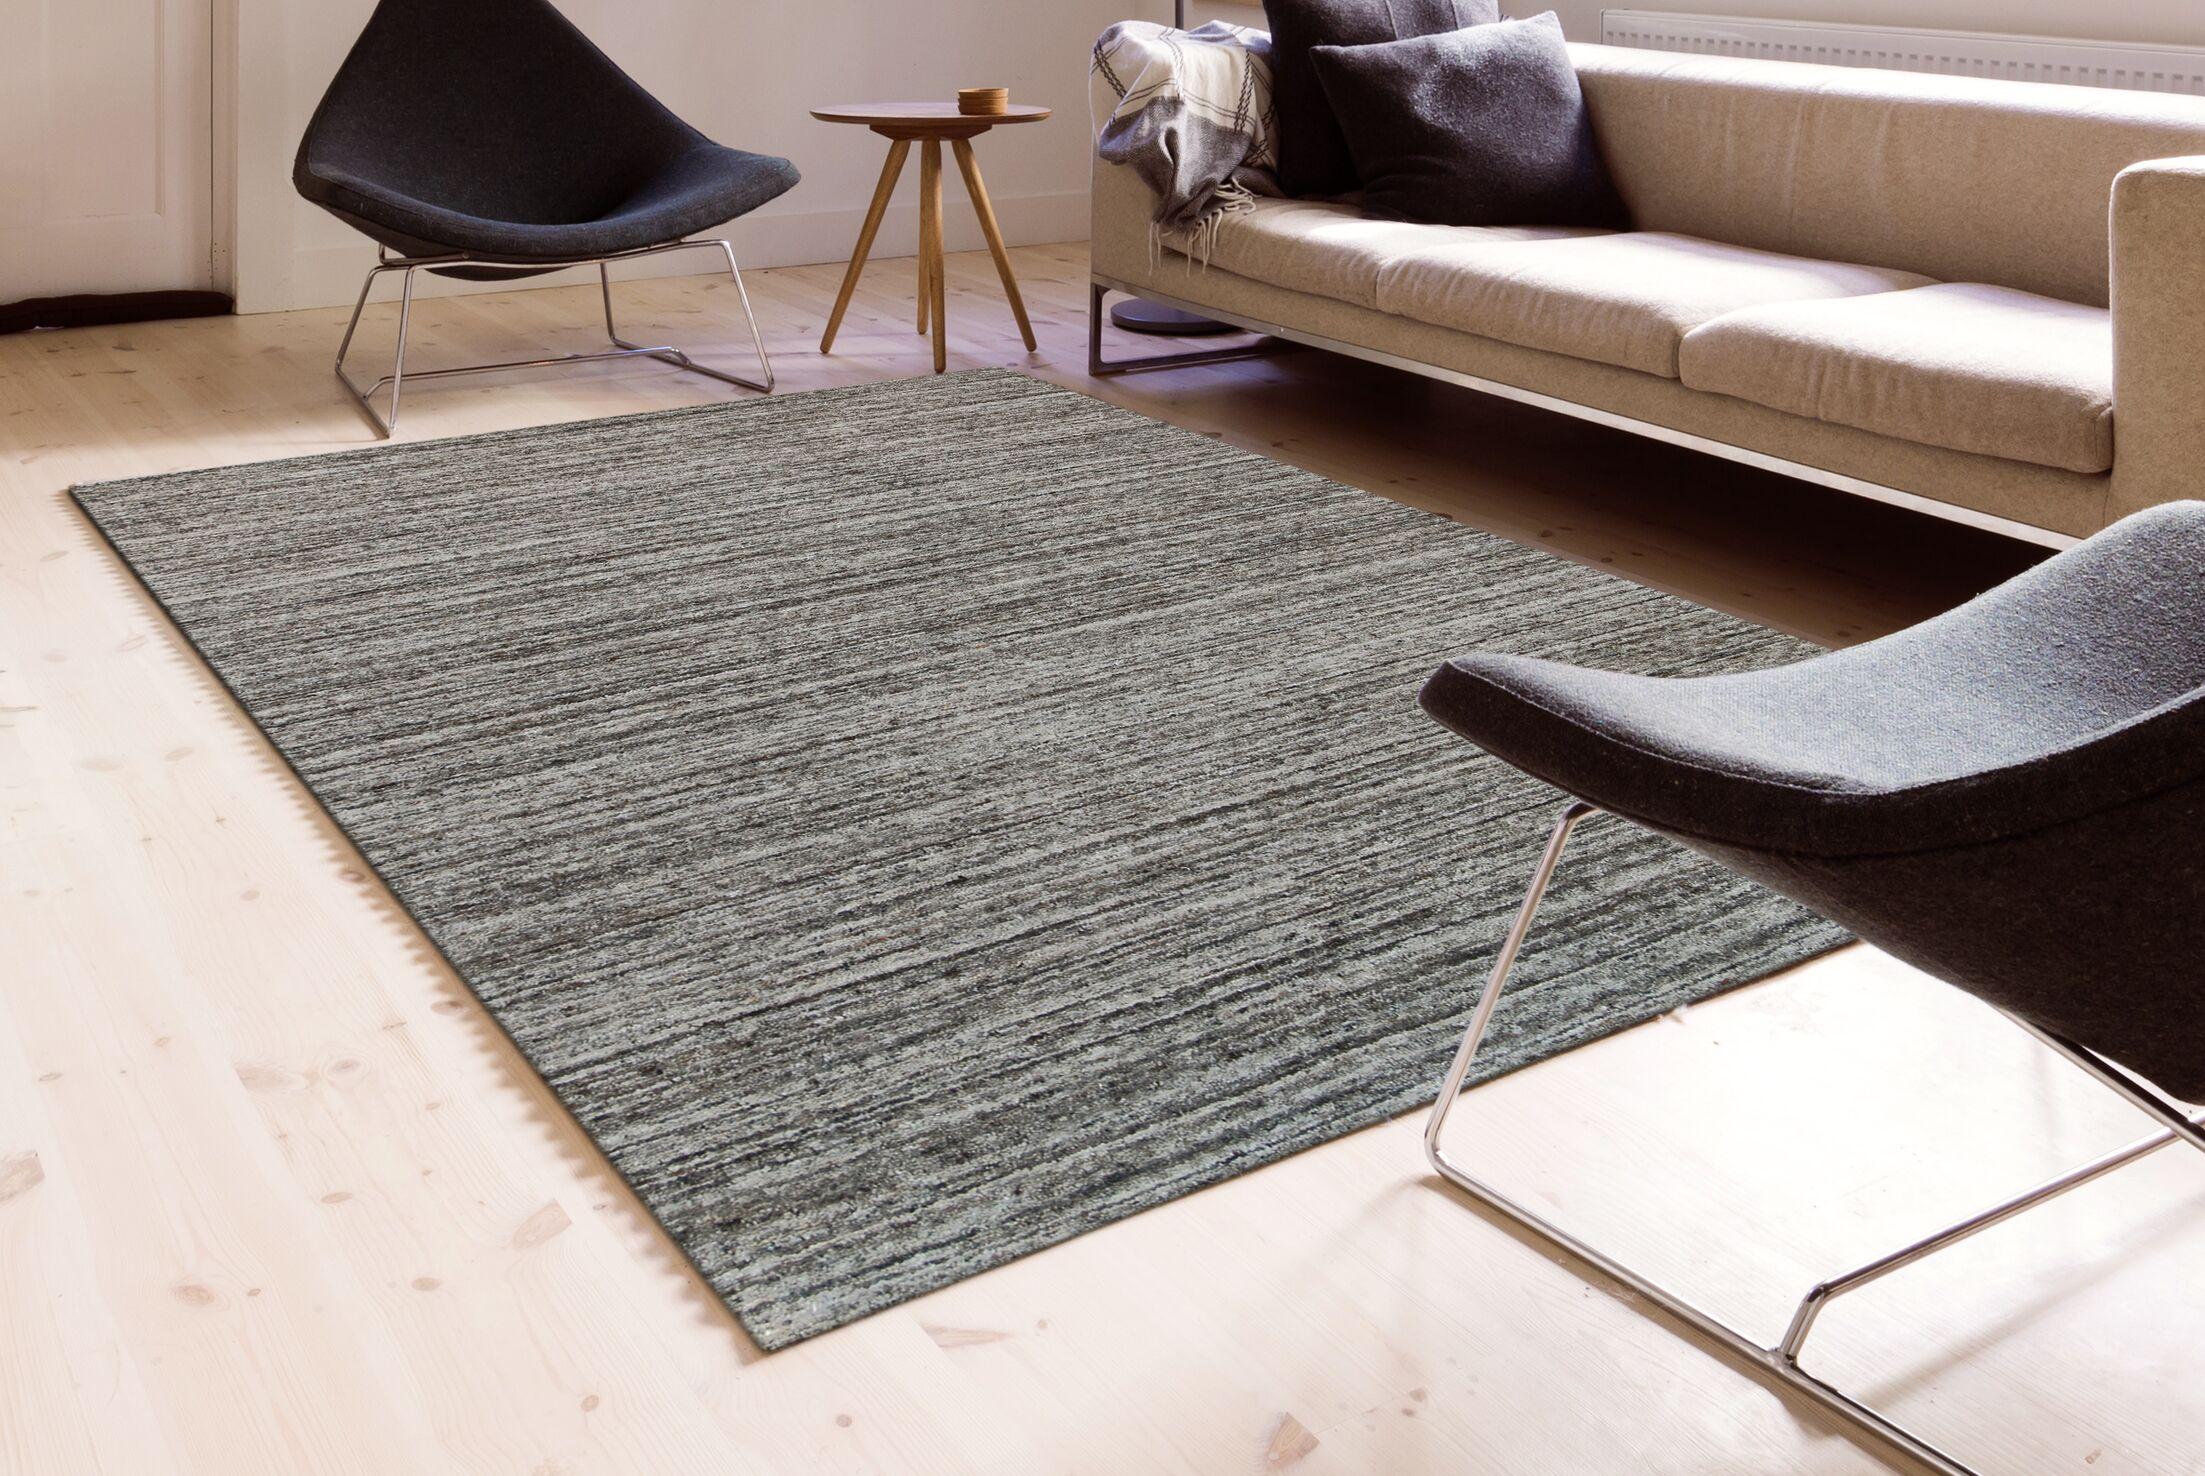 Holliman Hand-Woven Wool Iron Area Rug Rug Size: Rectangle 5' x 8'